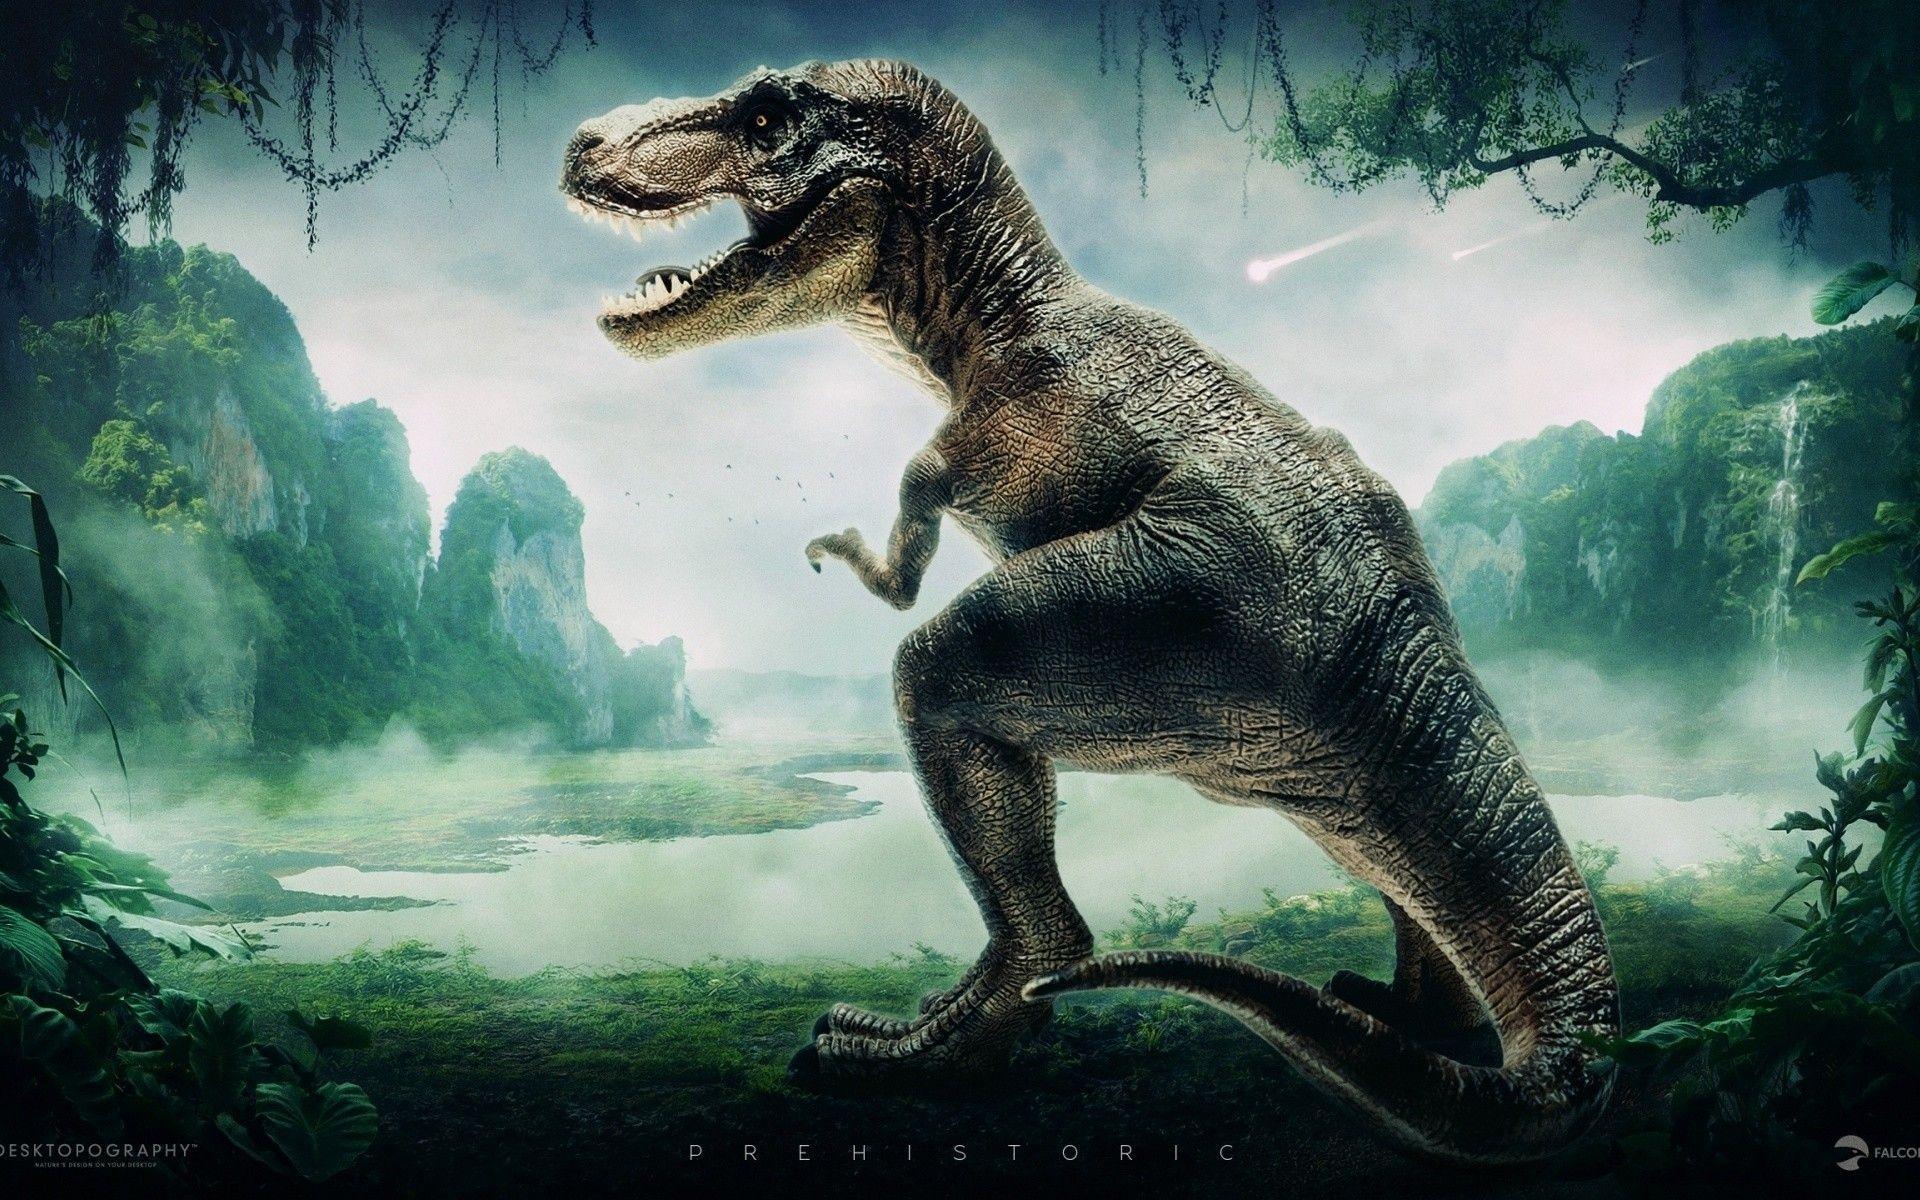 Dinosaur 4K Wallpapers - Top Free Dinosaur 4K Backgrounds - WallpaperAccess